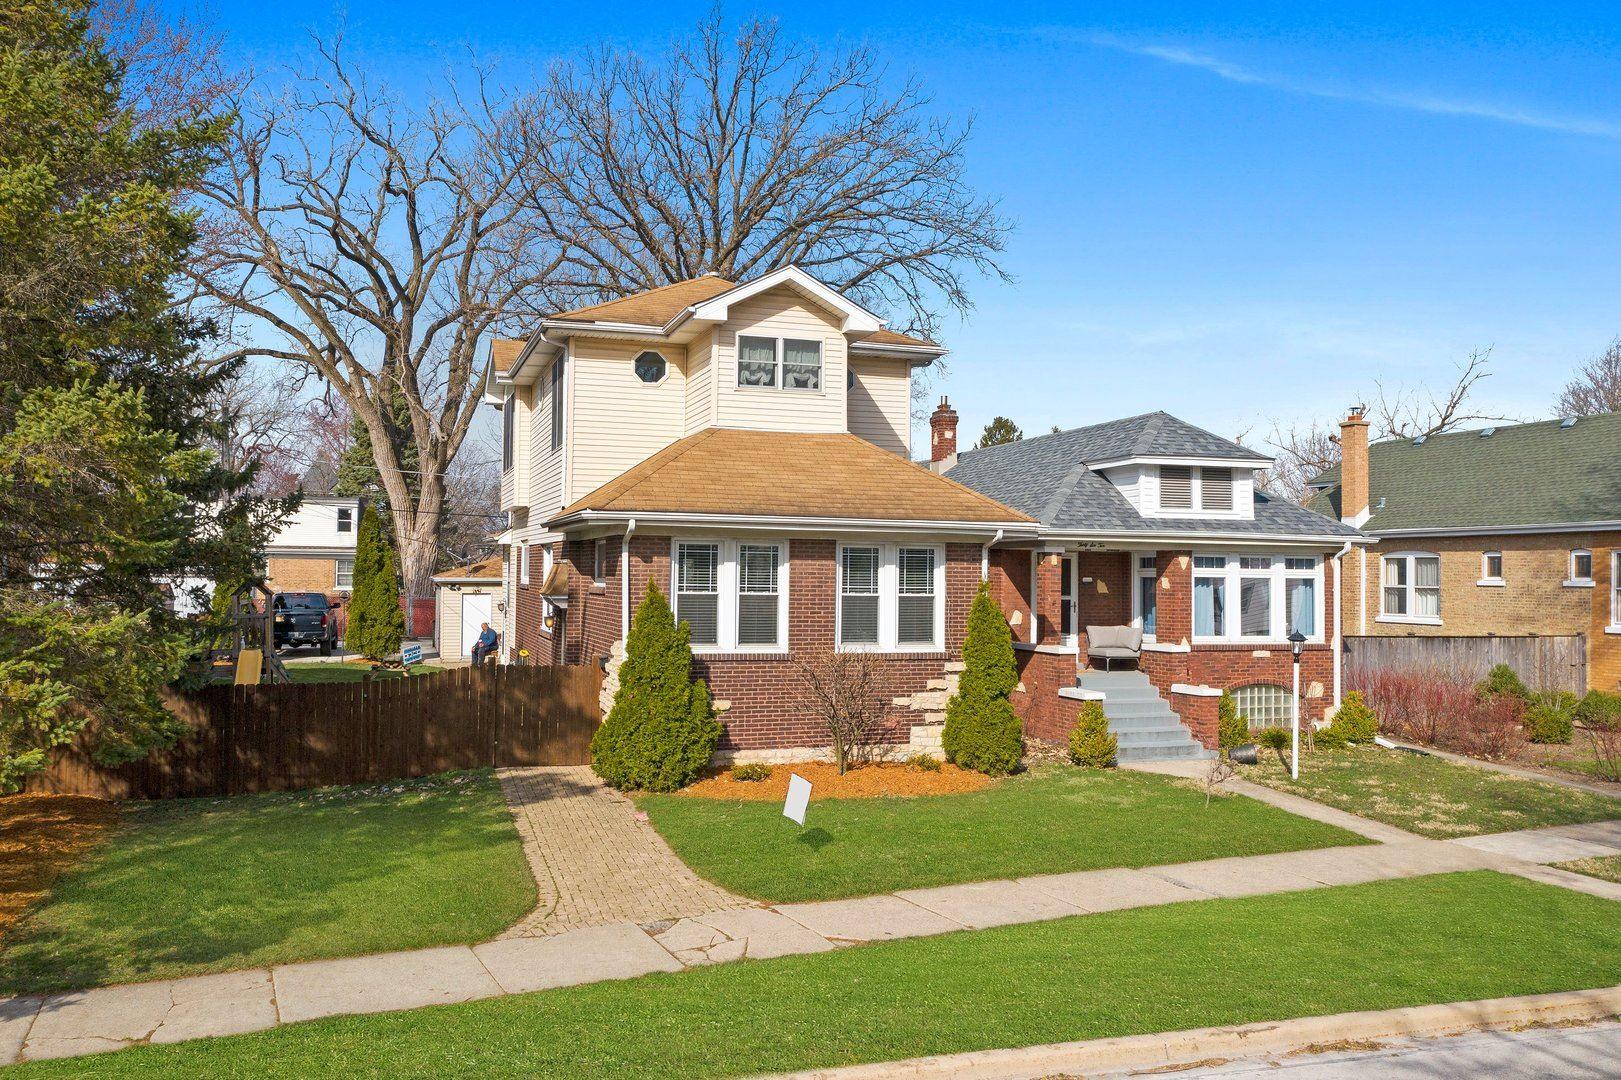 3612 Woodside Avenue, Brookfield, IL 60513 - #: 11041871